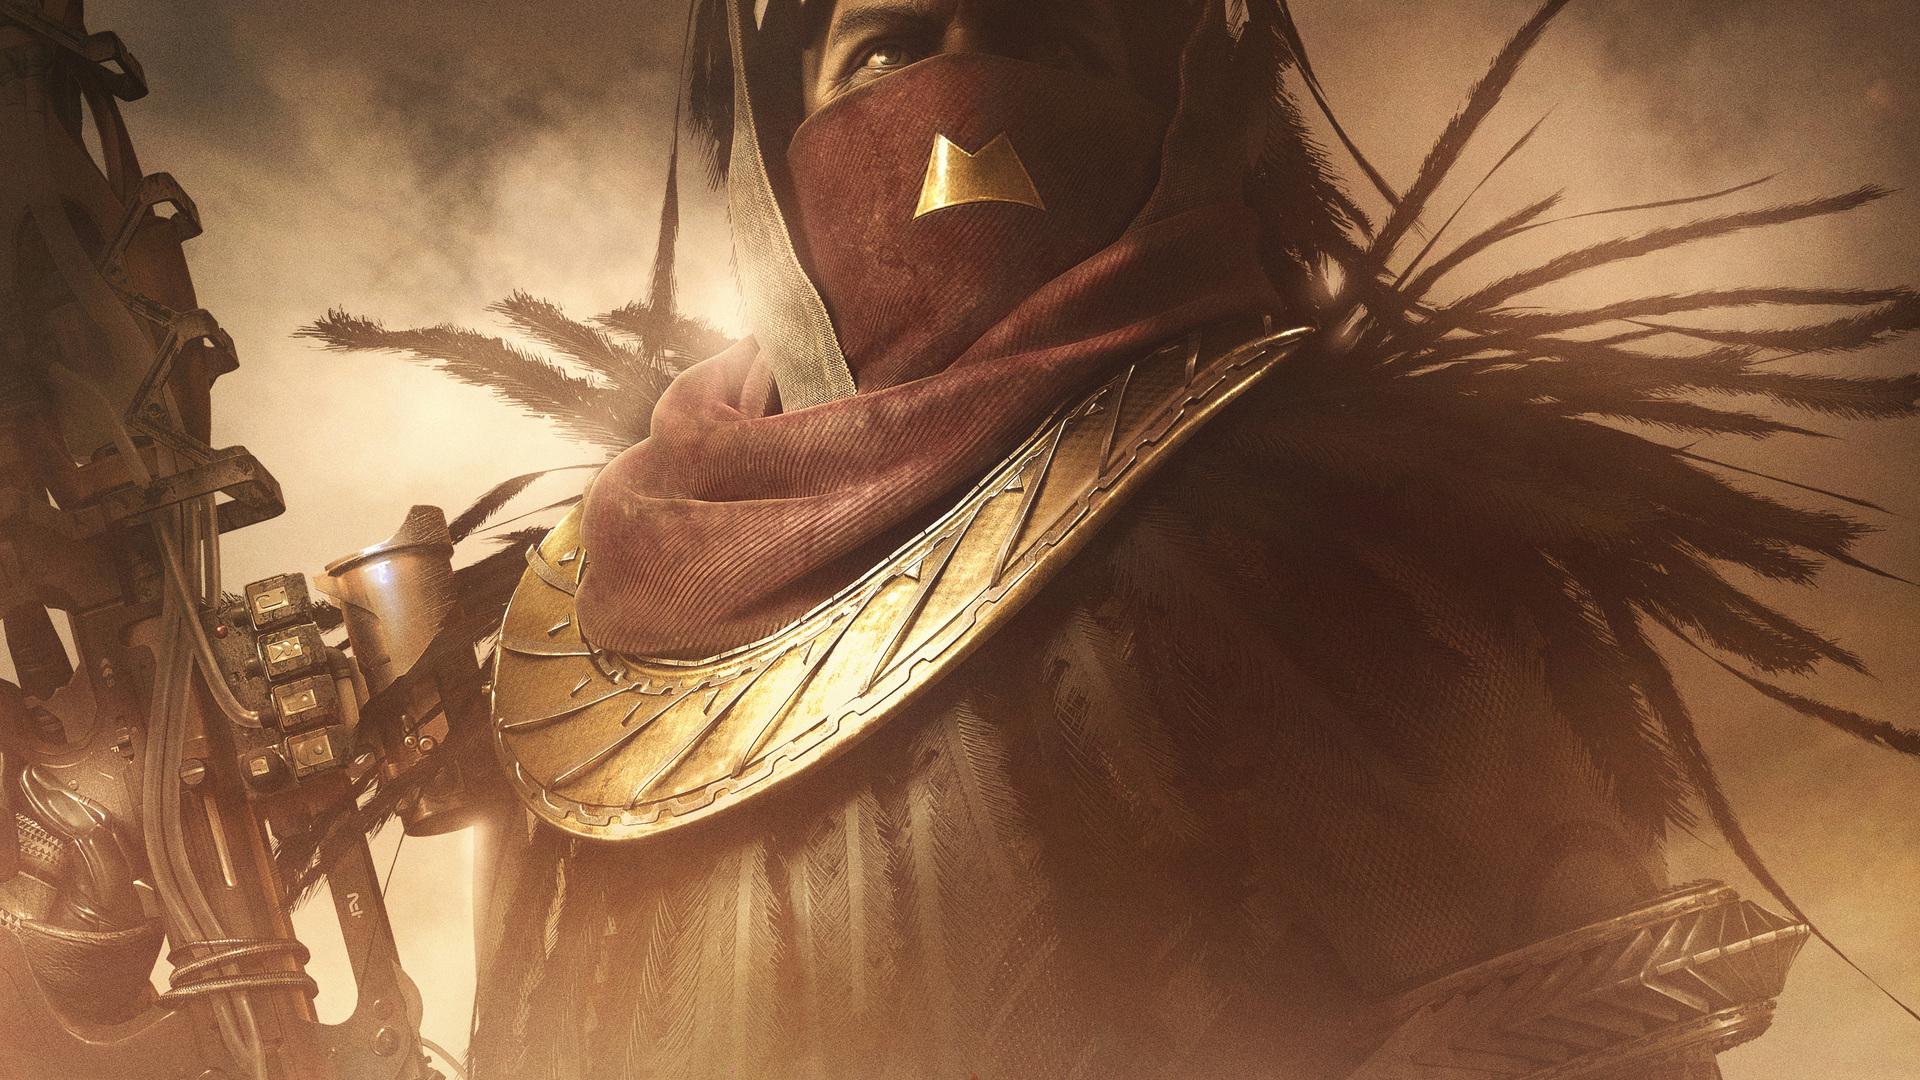 Destiny 2 1080p Wallpaper: 1920x1080 Destiny 2 Expansion 1 Curse Of Osiris 4k Laptop